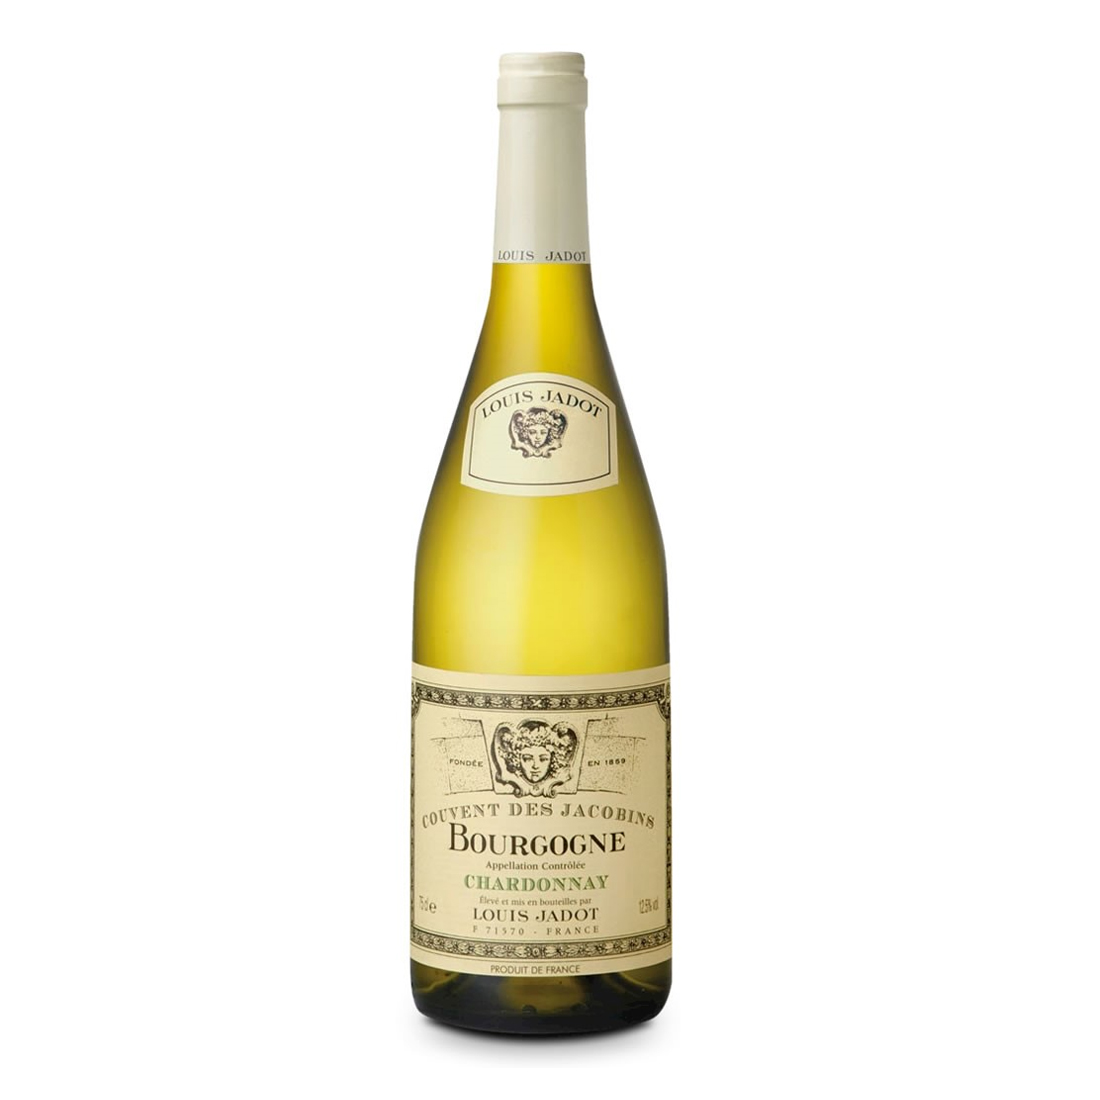 Vinho Louis Jadot Bourgogne Chardonnay Couvent Jacobins 750 ml